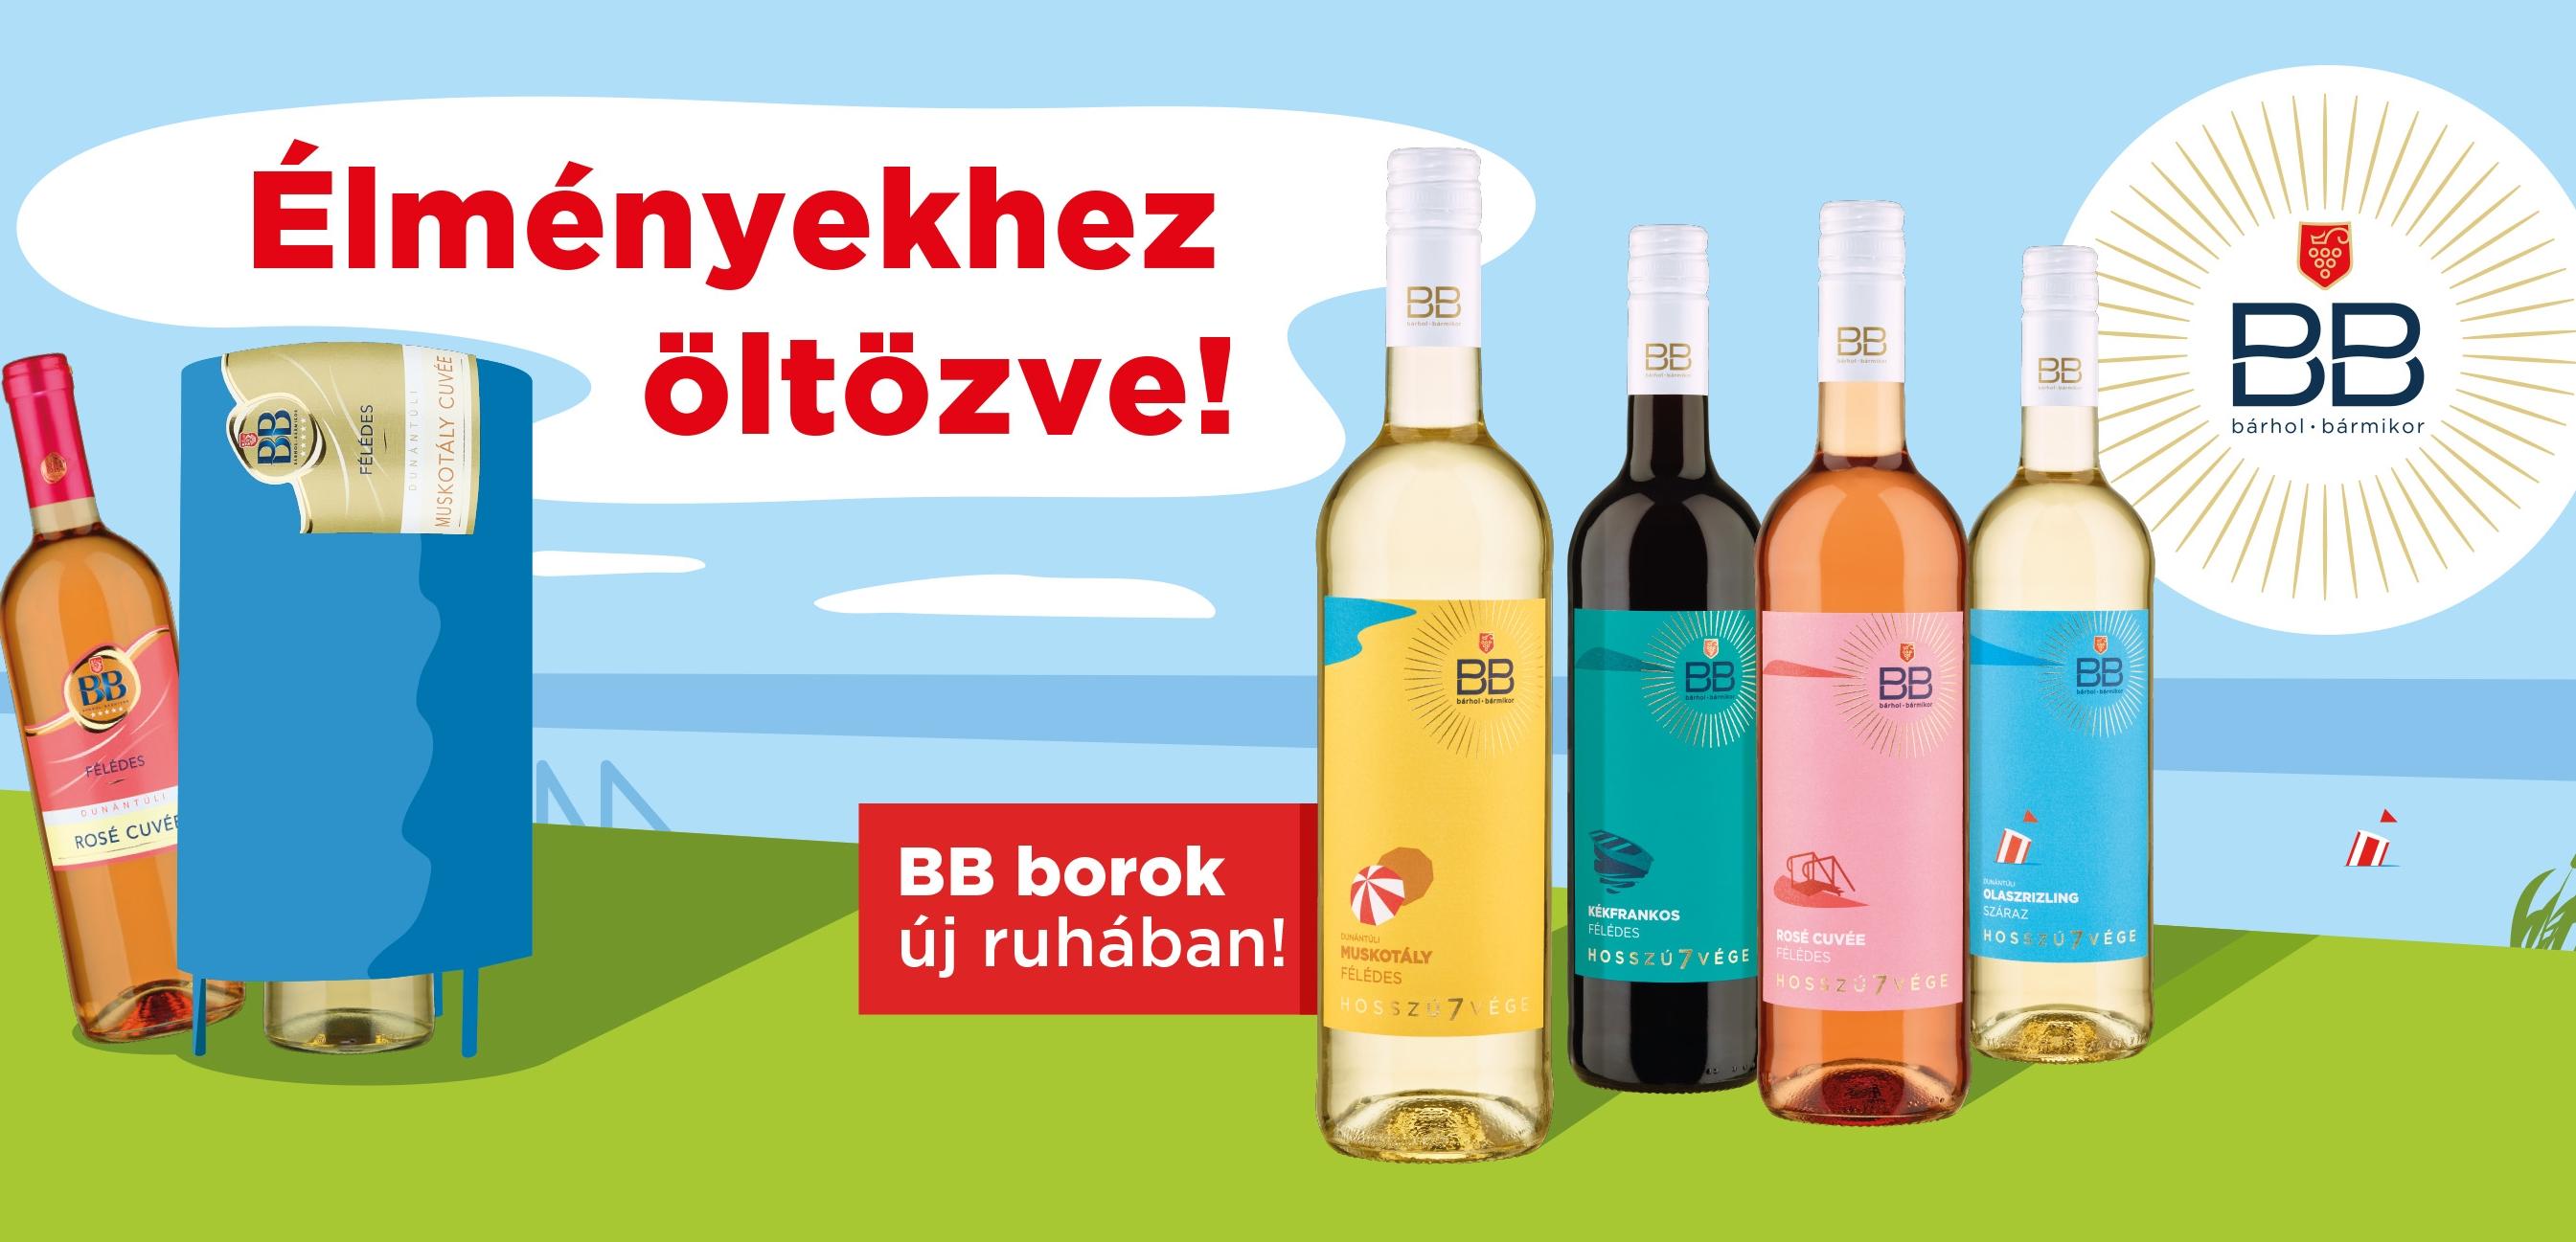 BB borok pohárban